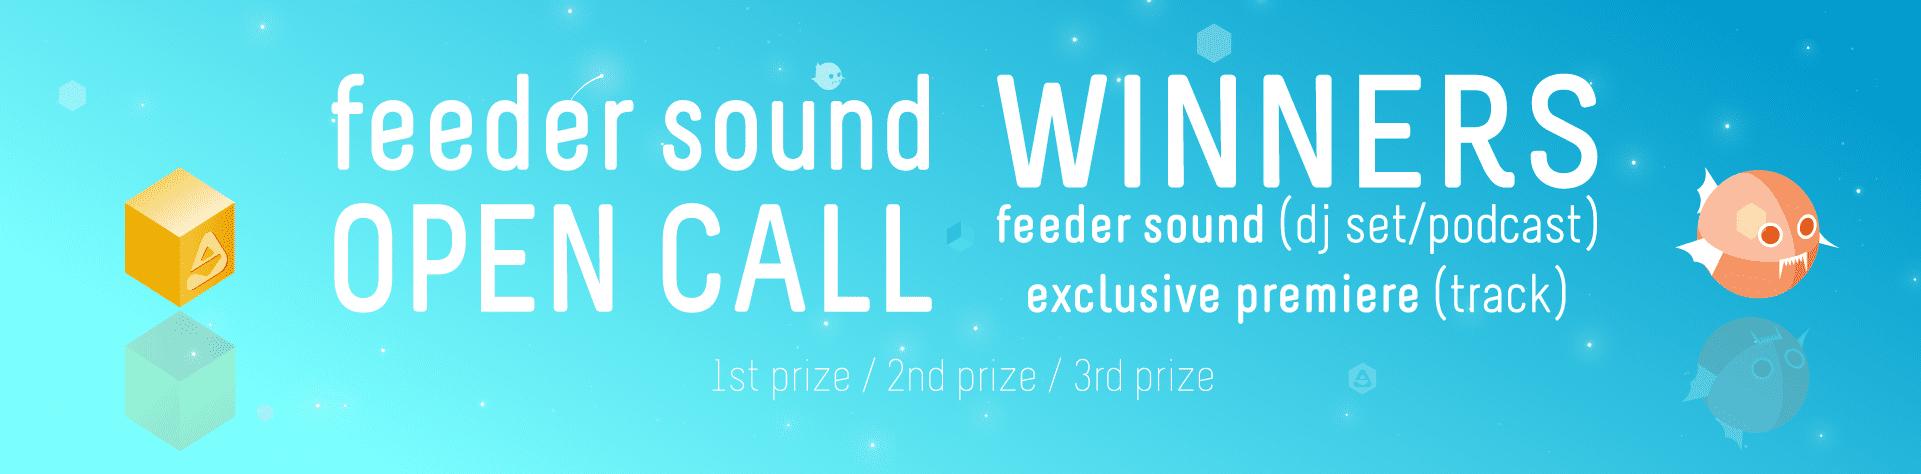 feeder sound OPEN CALL Winners 2019